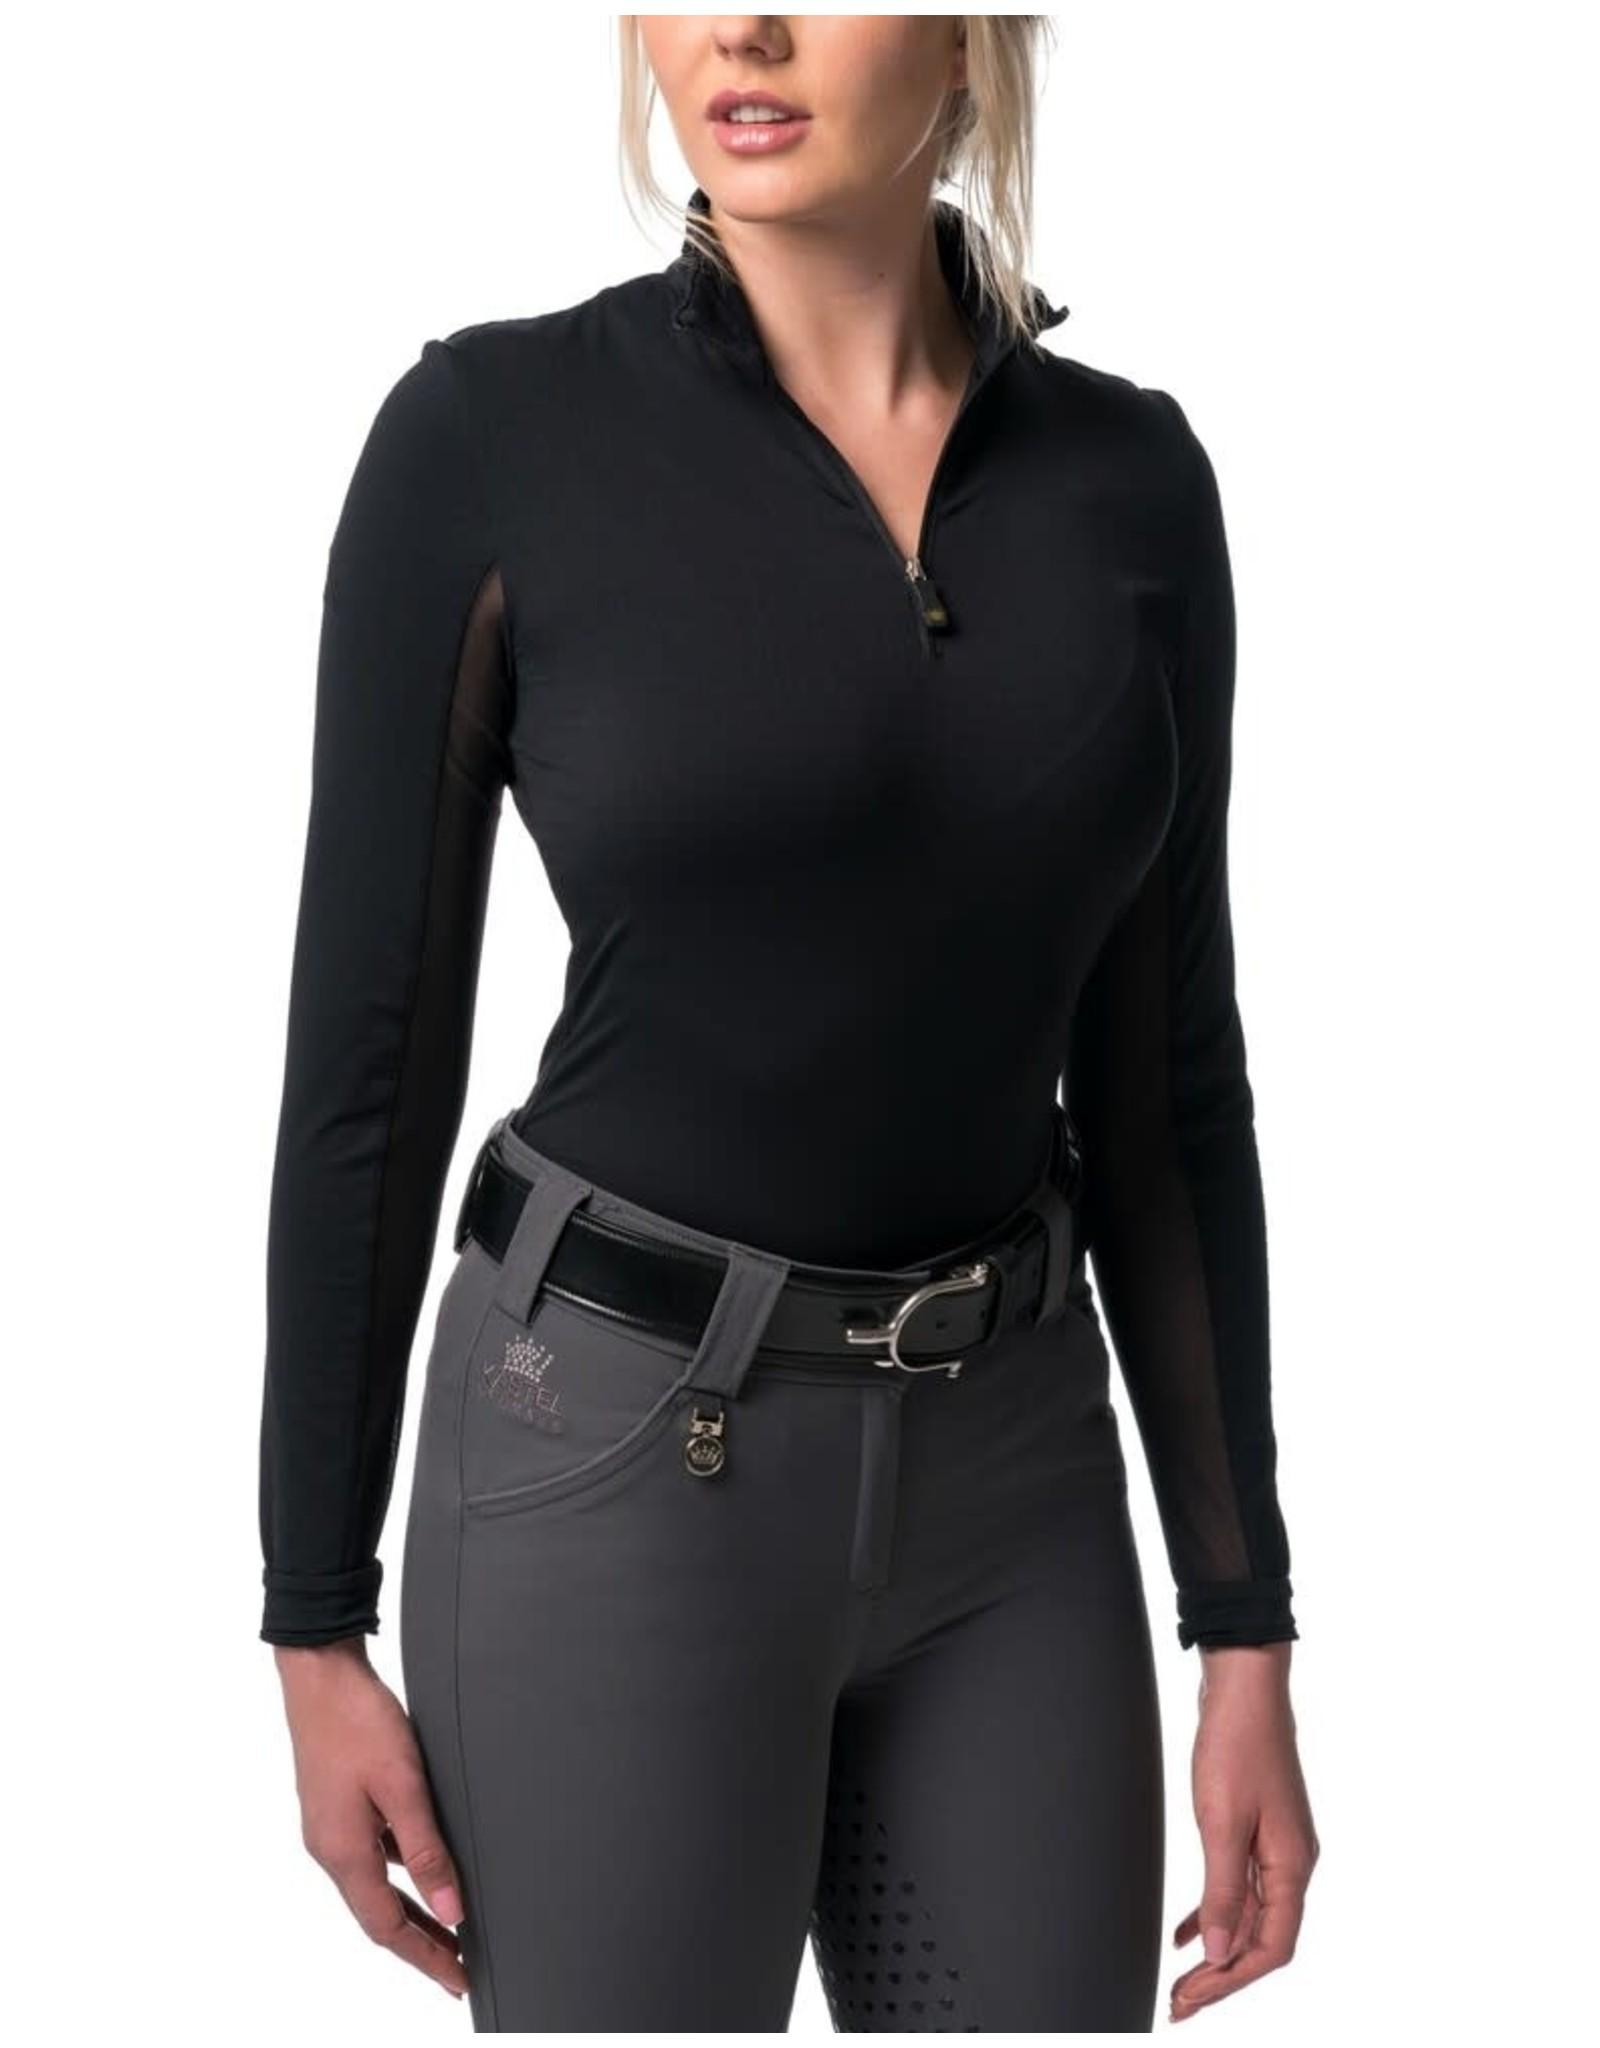 Kastel Sun Shirt Charlotte Long Sleeve 1/4 Zip Black with Black Trim